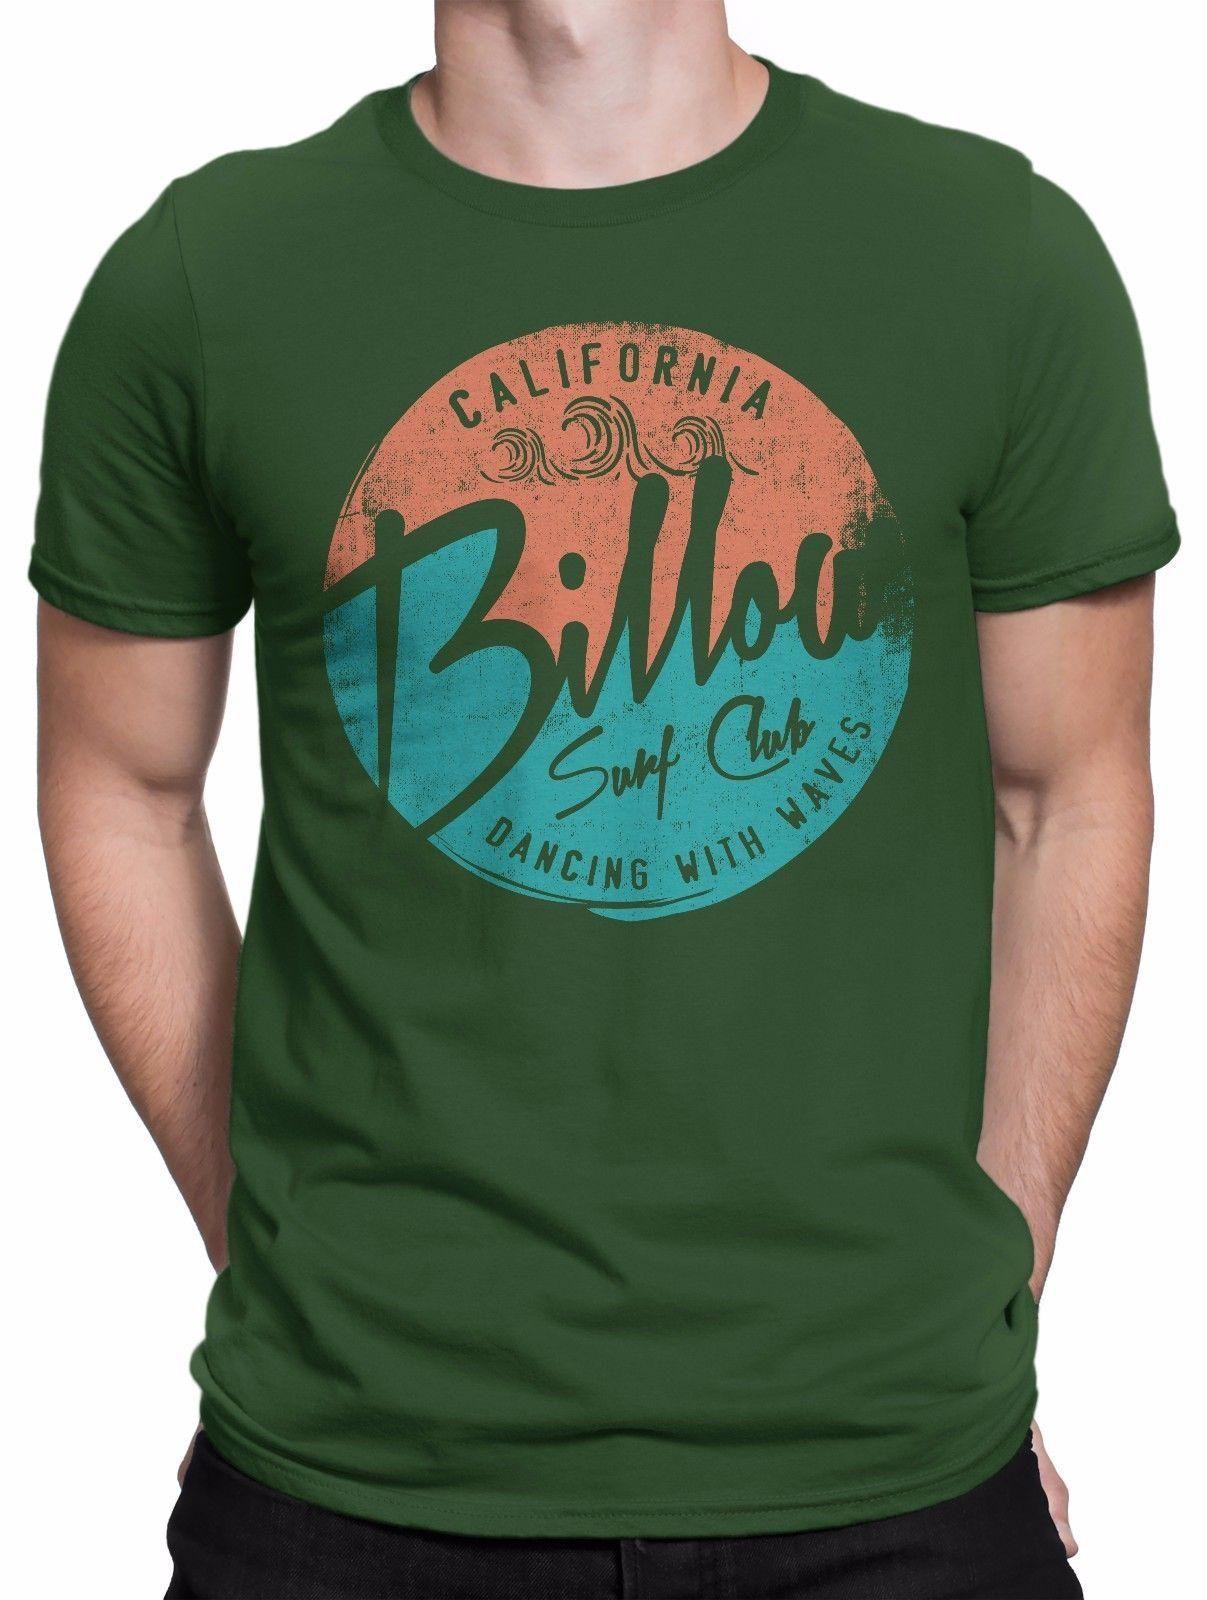 differently d26b5 8e7fe T-SHIRT Uomo Billow Surf Club - maglietta 100% cotone - VERDE